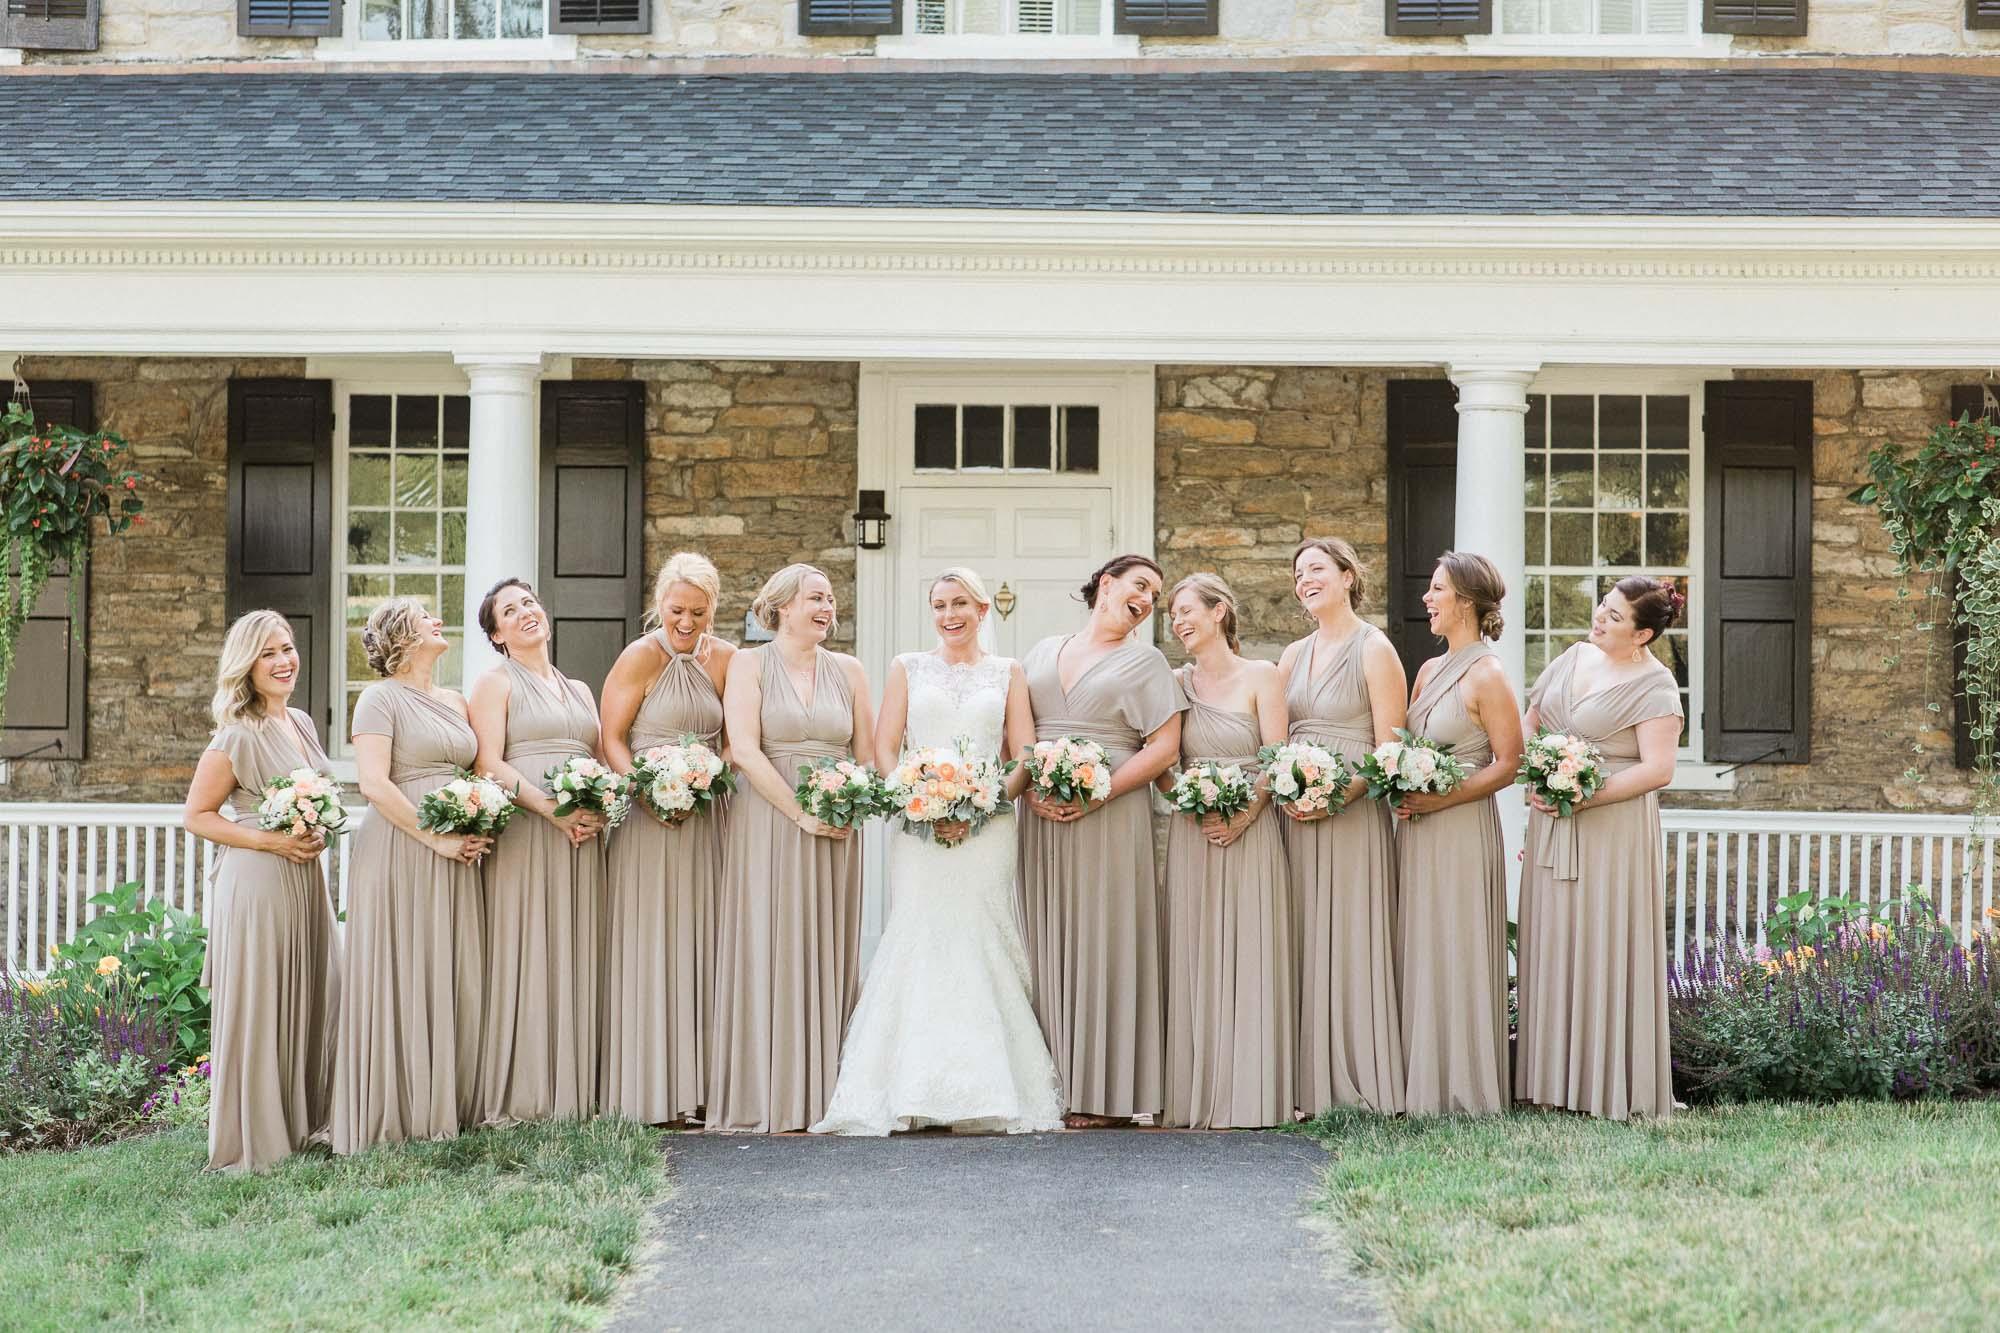 Allenberry-resort-historic-pennsylvania-wedding-22188.jpg